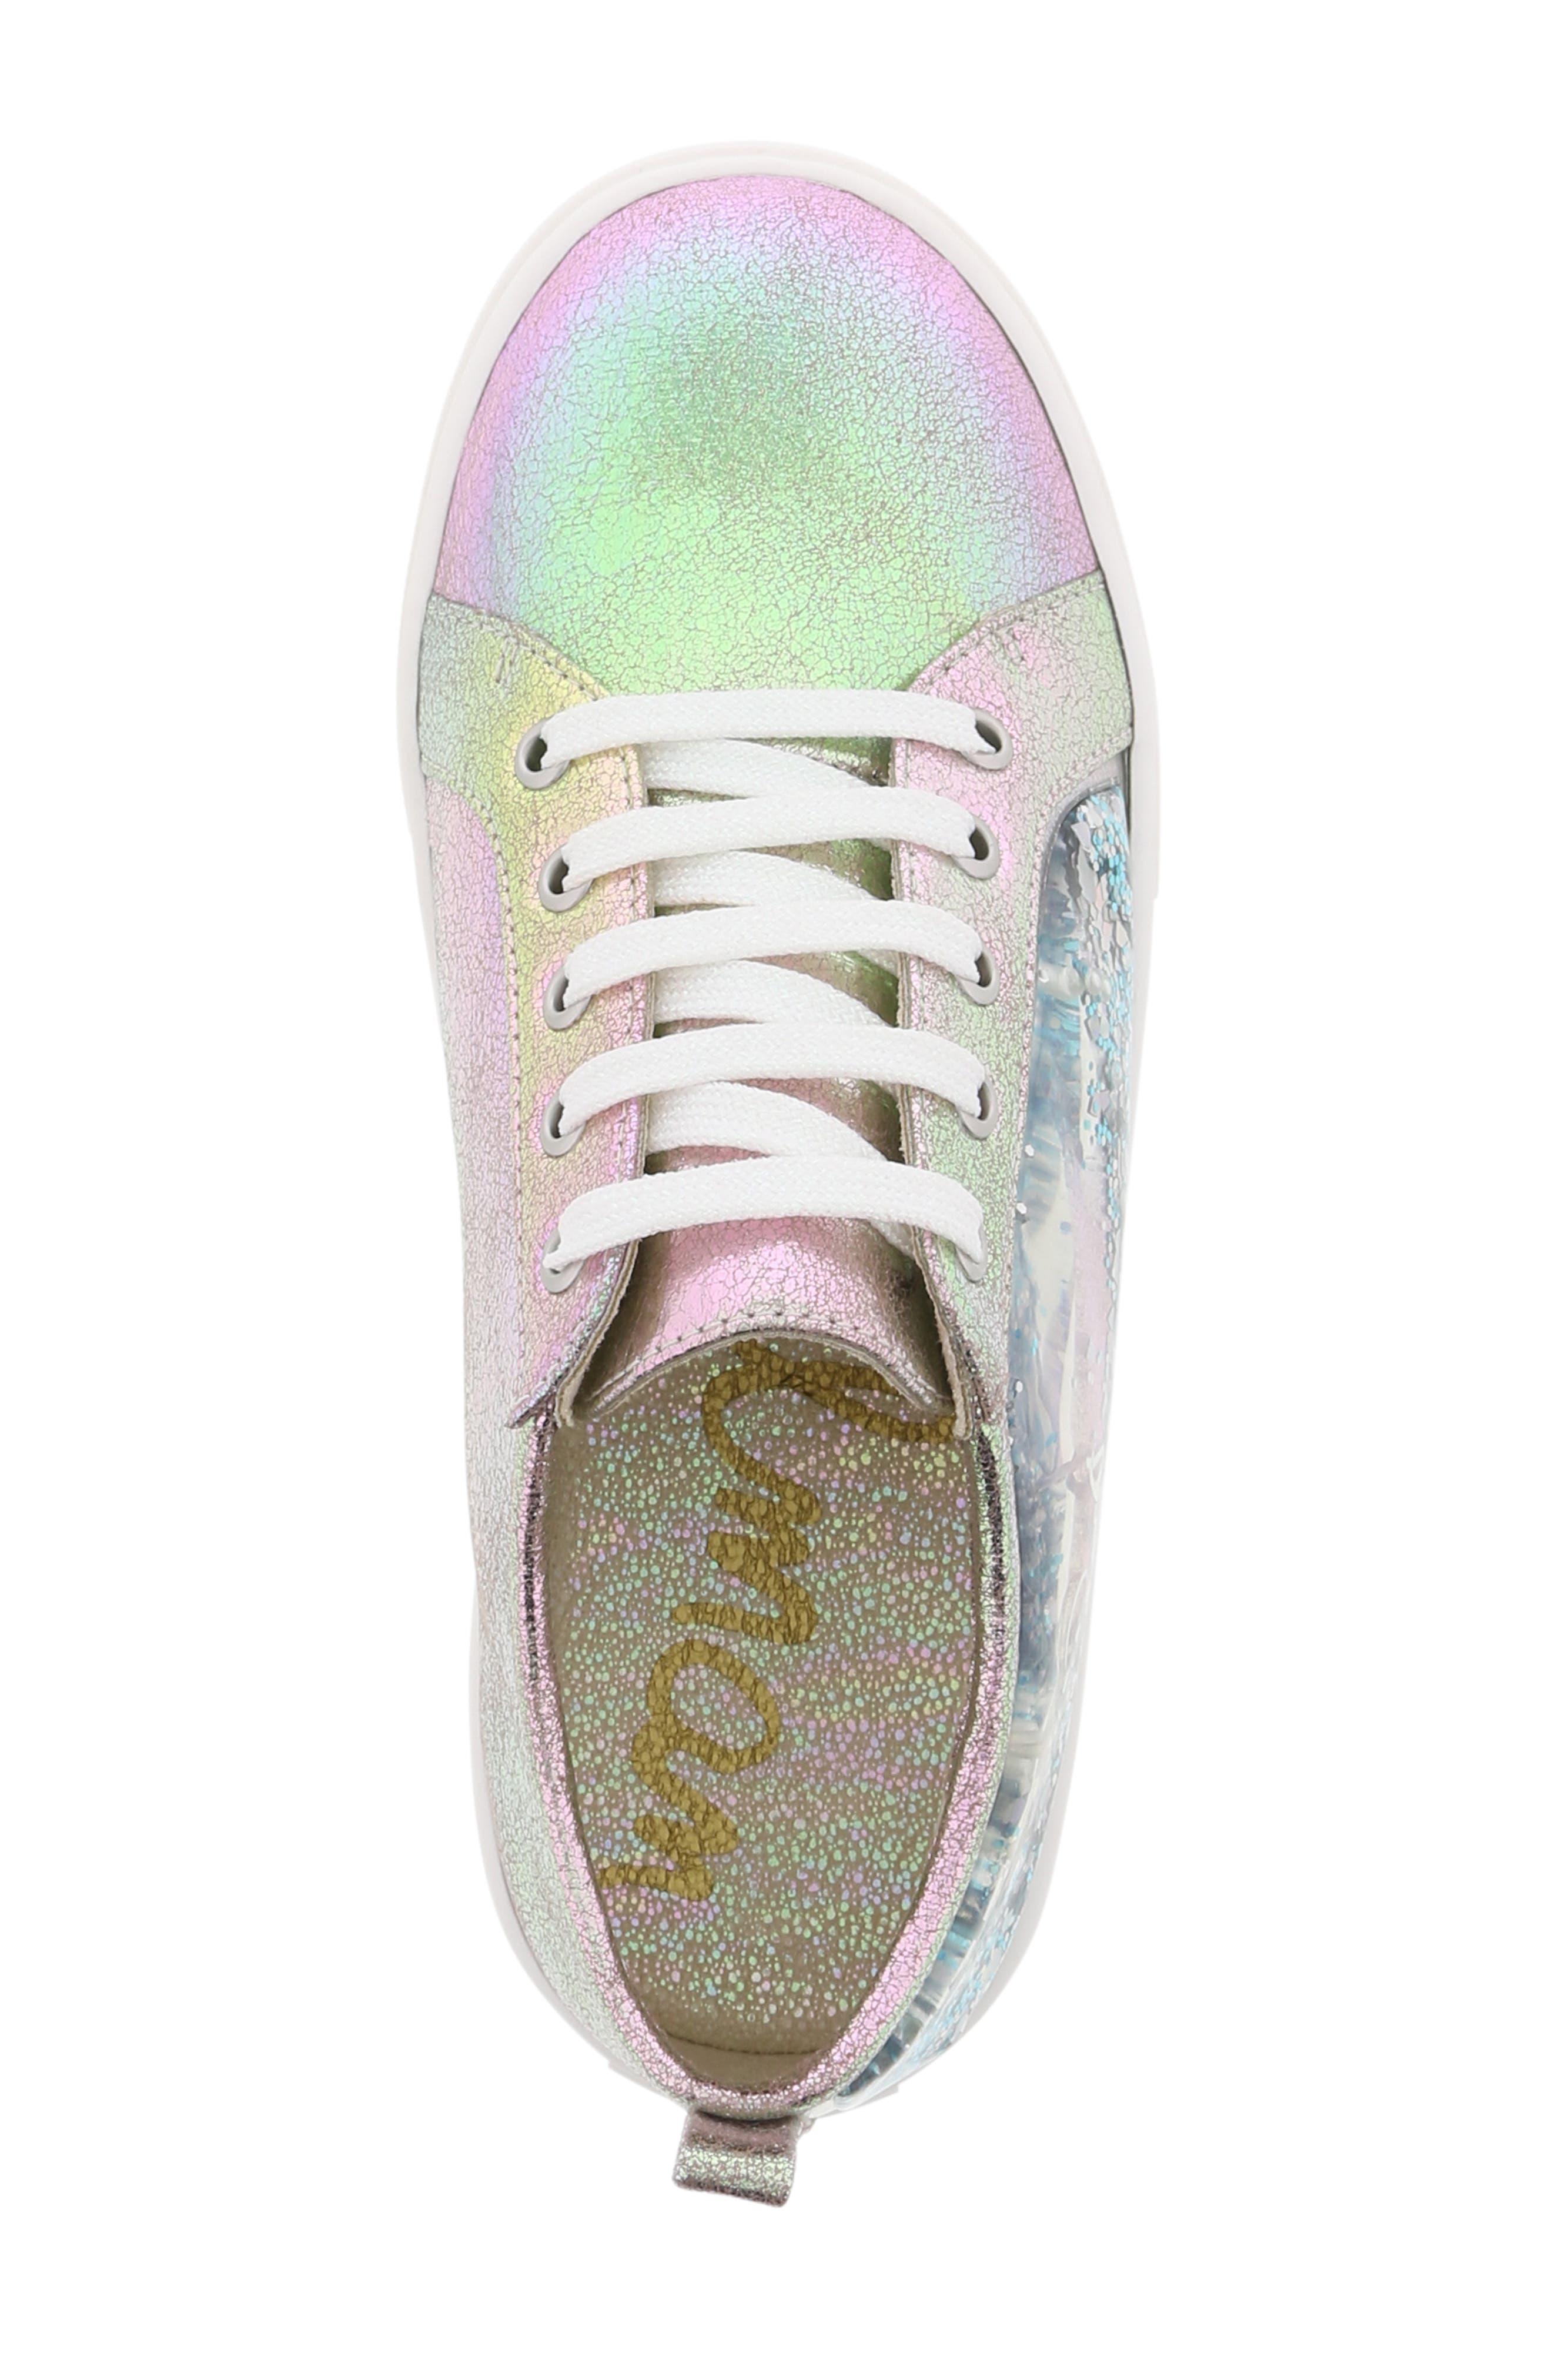 Bella Aqua Slip-On Sneaker,                             Alternate thumbnail 5, color,                             GASOLINE IRIDESCENT